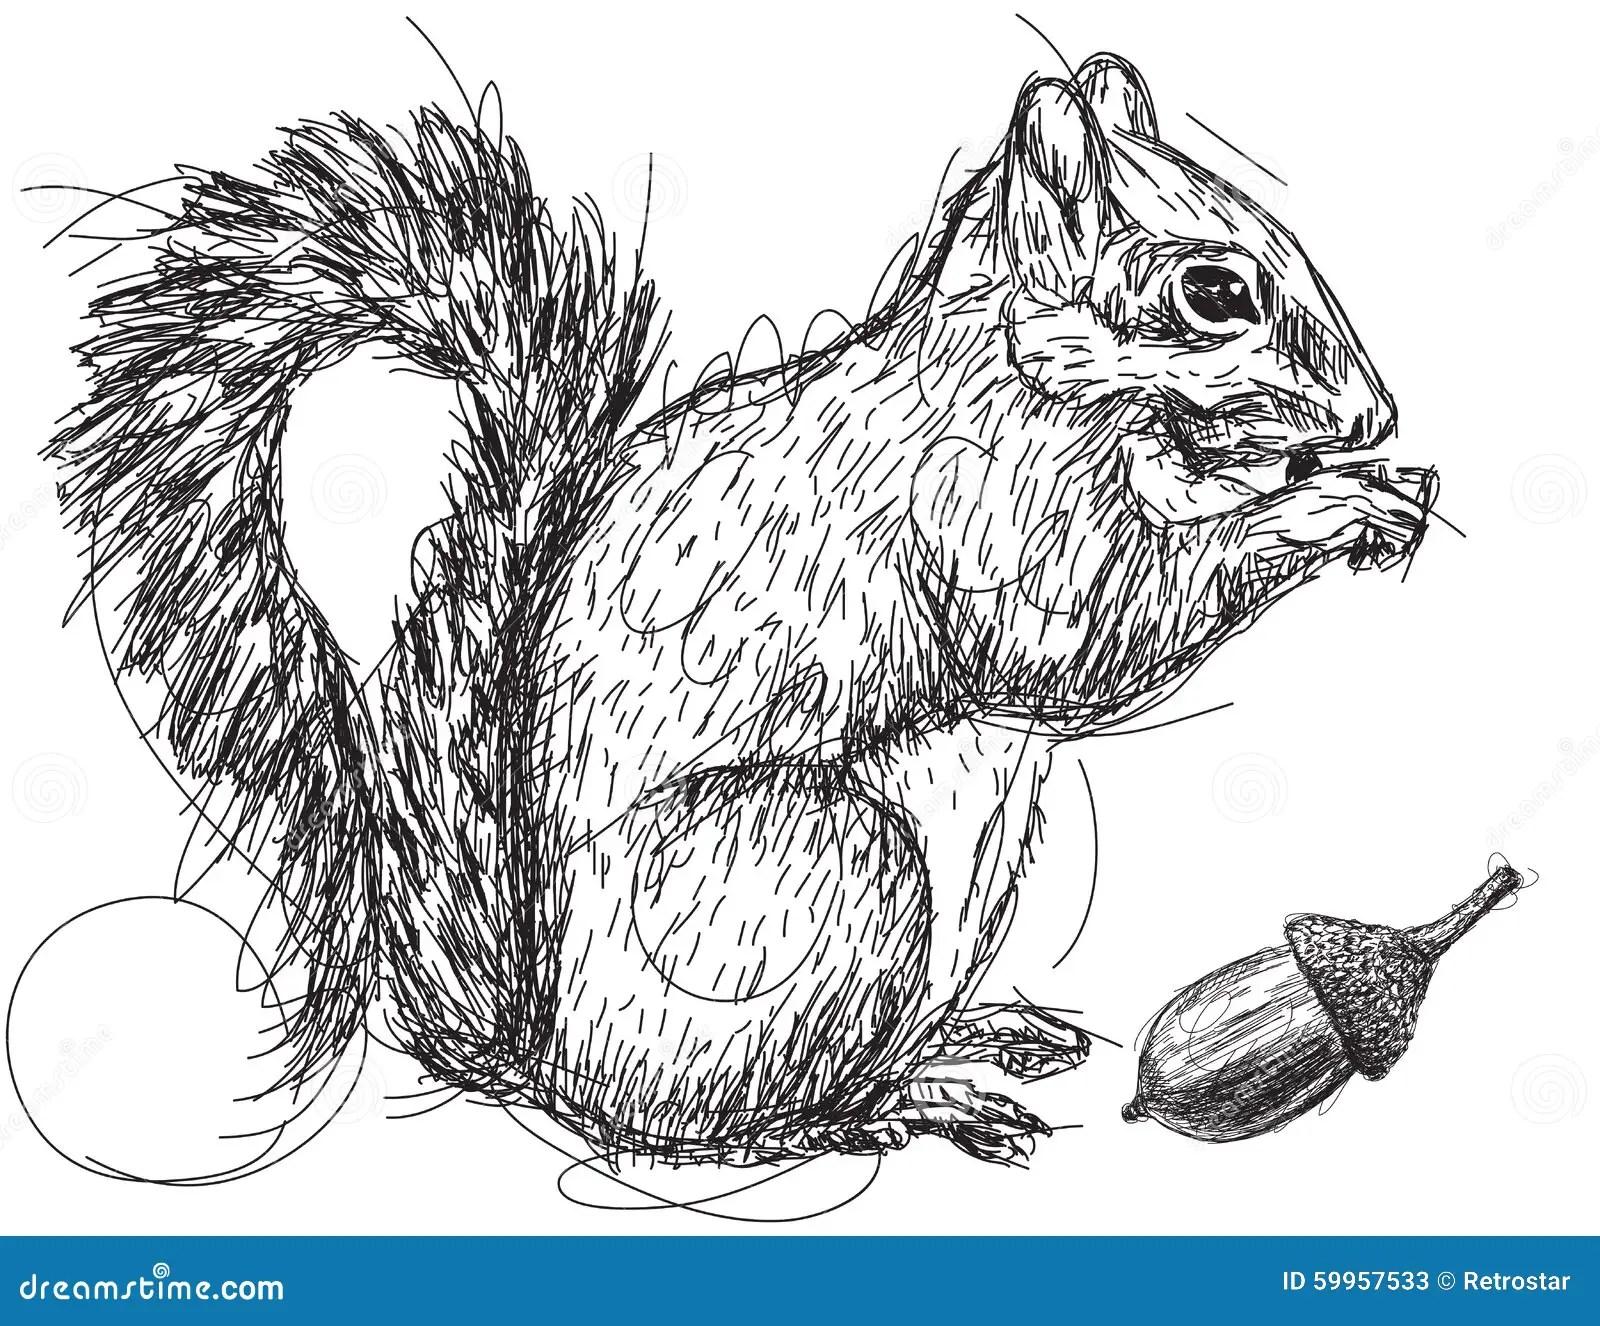 Squirrel Nut Sketch Stock Vector Illustration Of Doodle